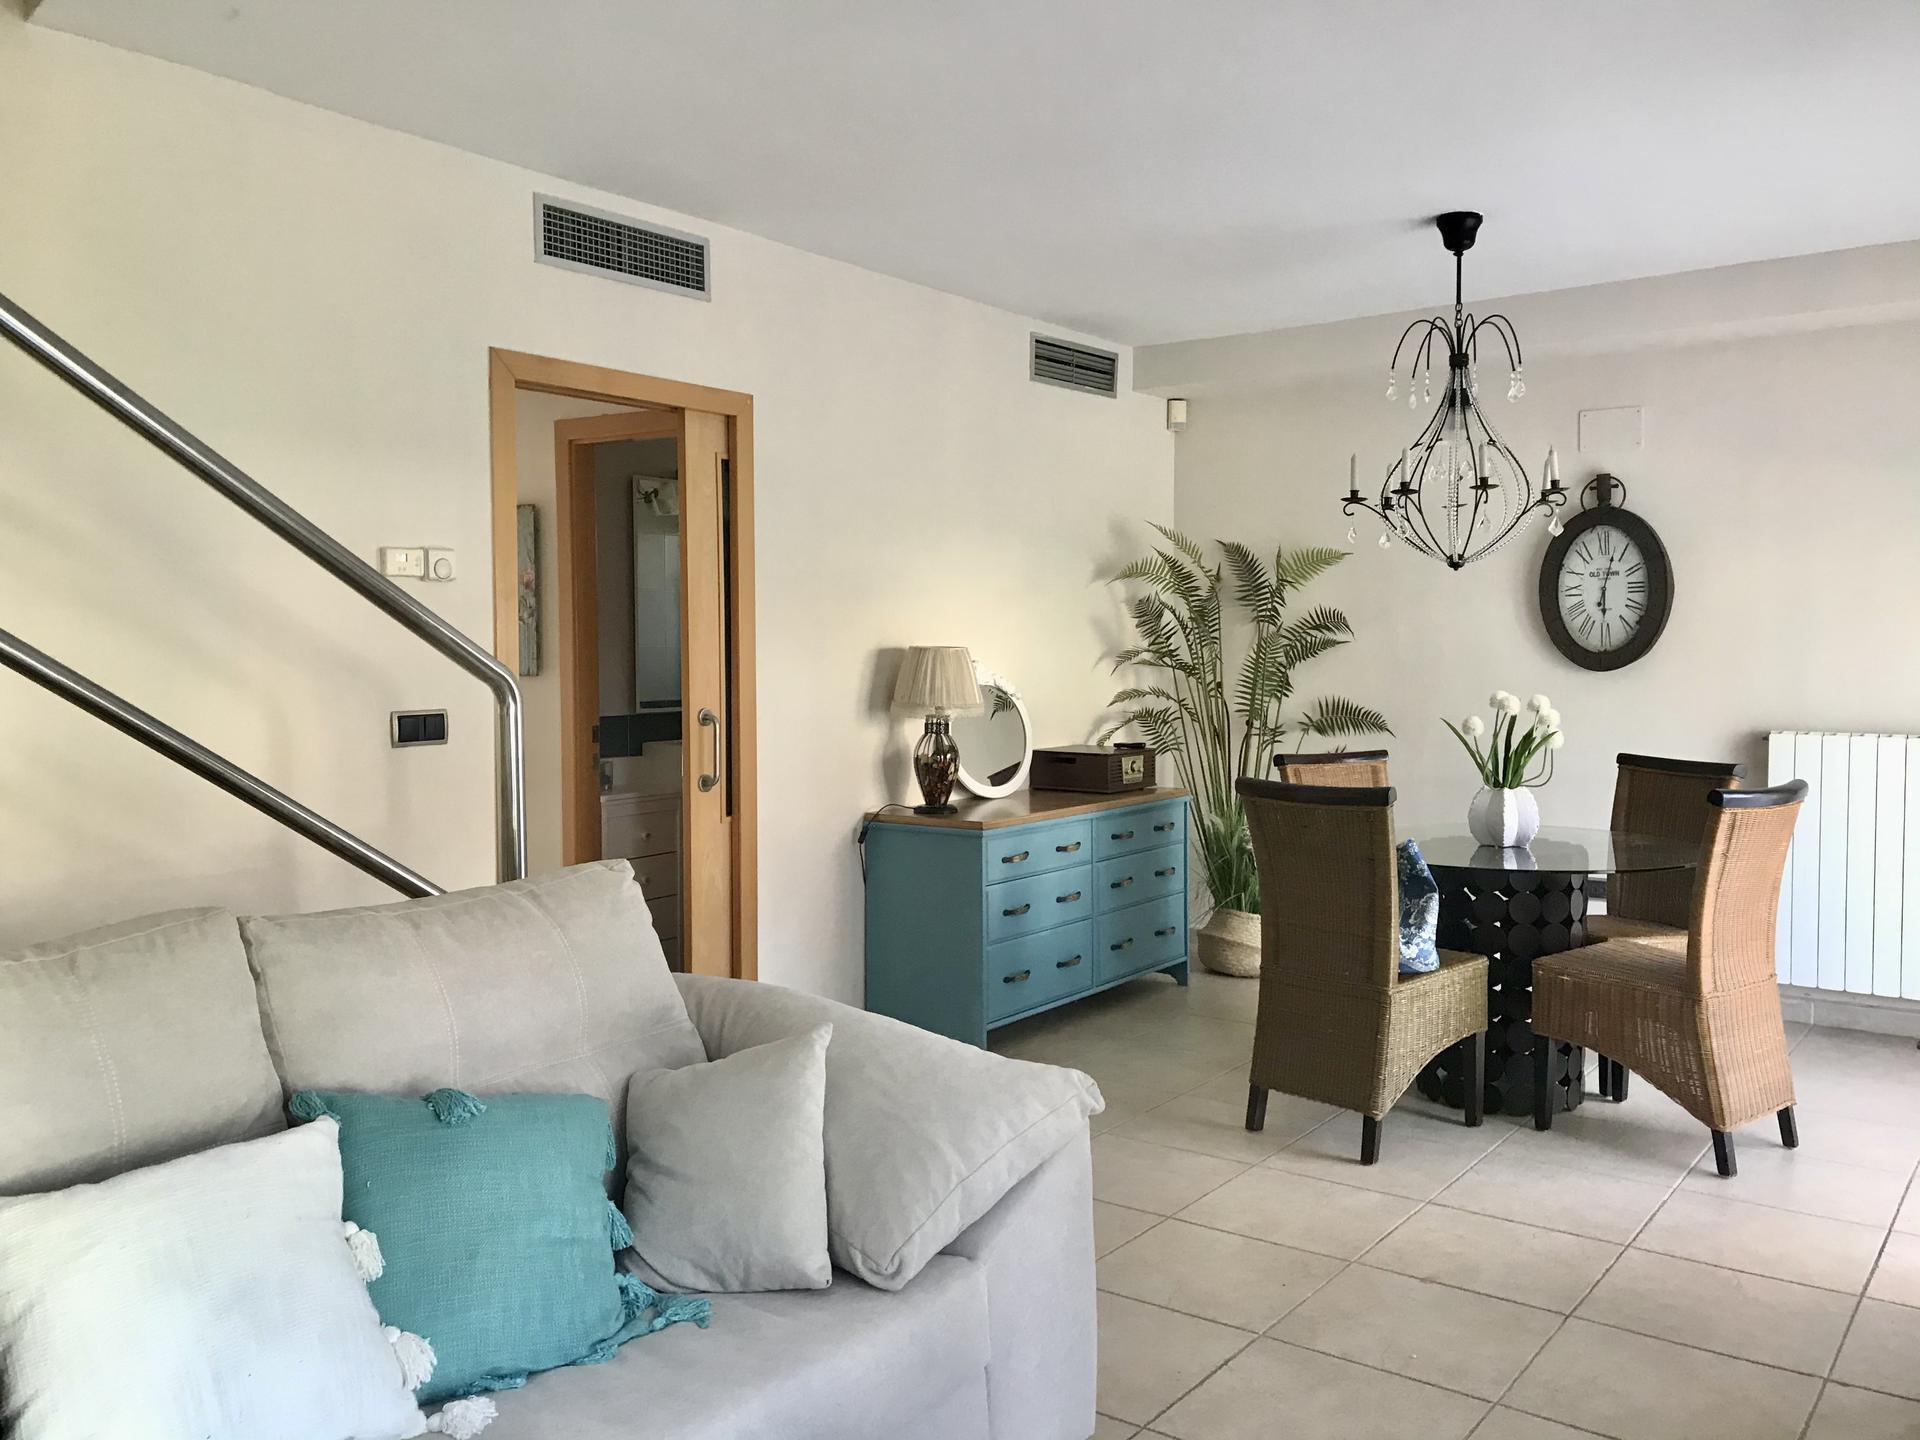 Casa -                                       Cambrils -                                       3 dormitorios -                                       6 ocupantes